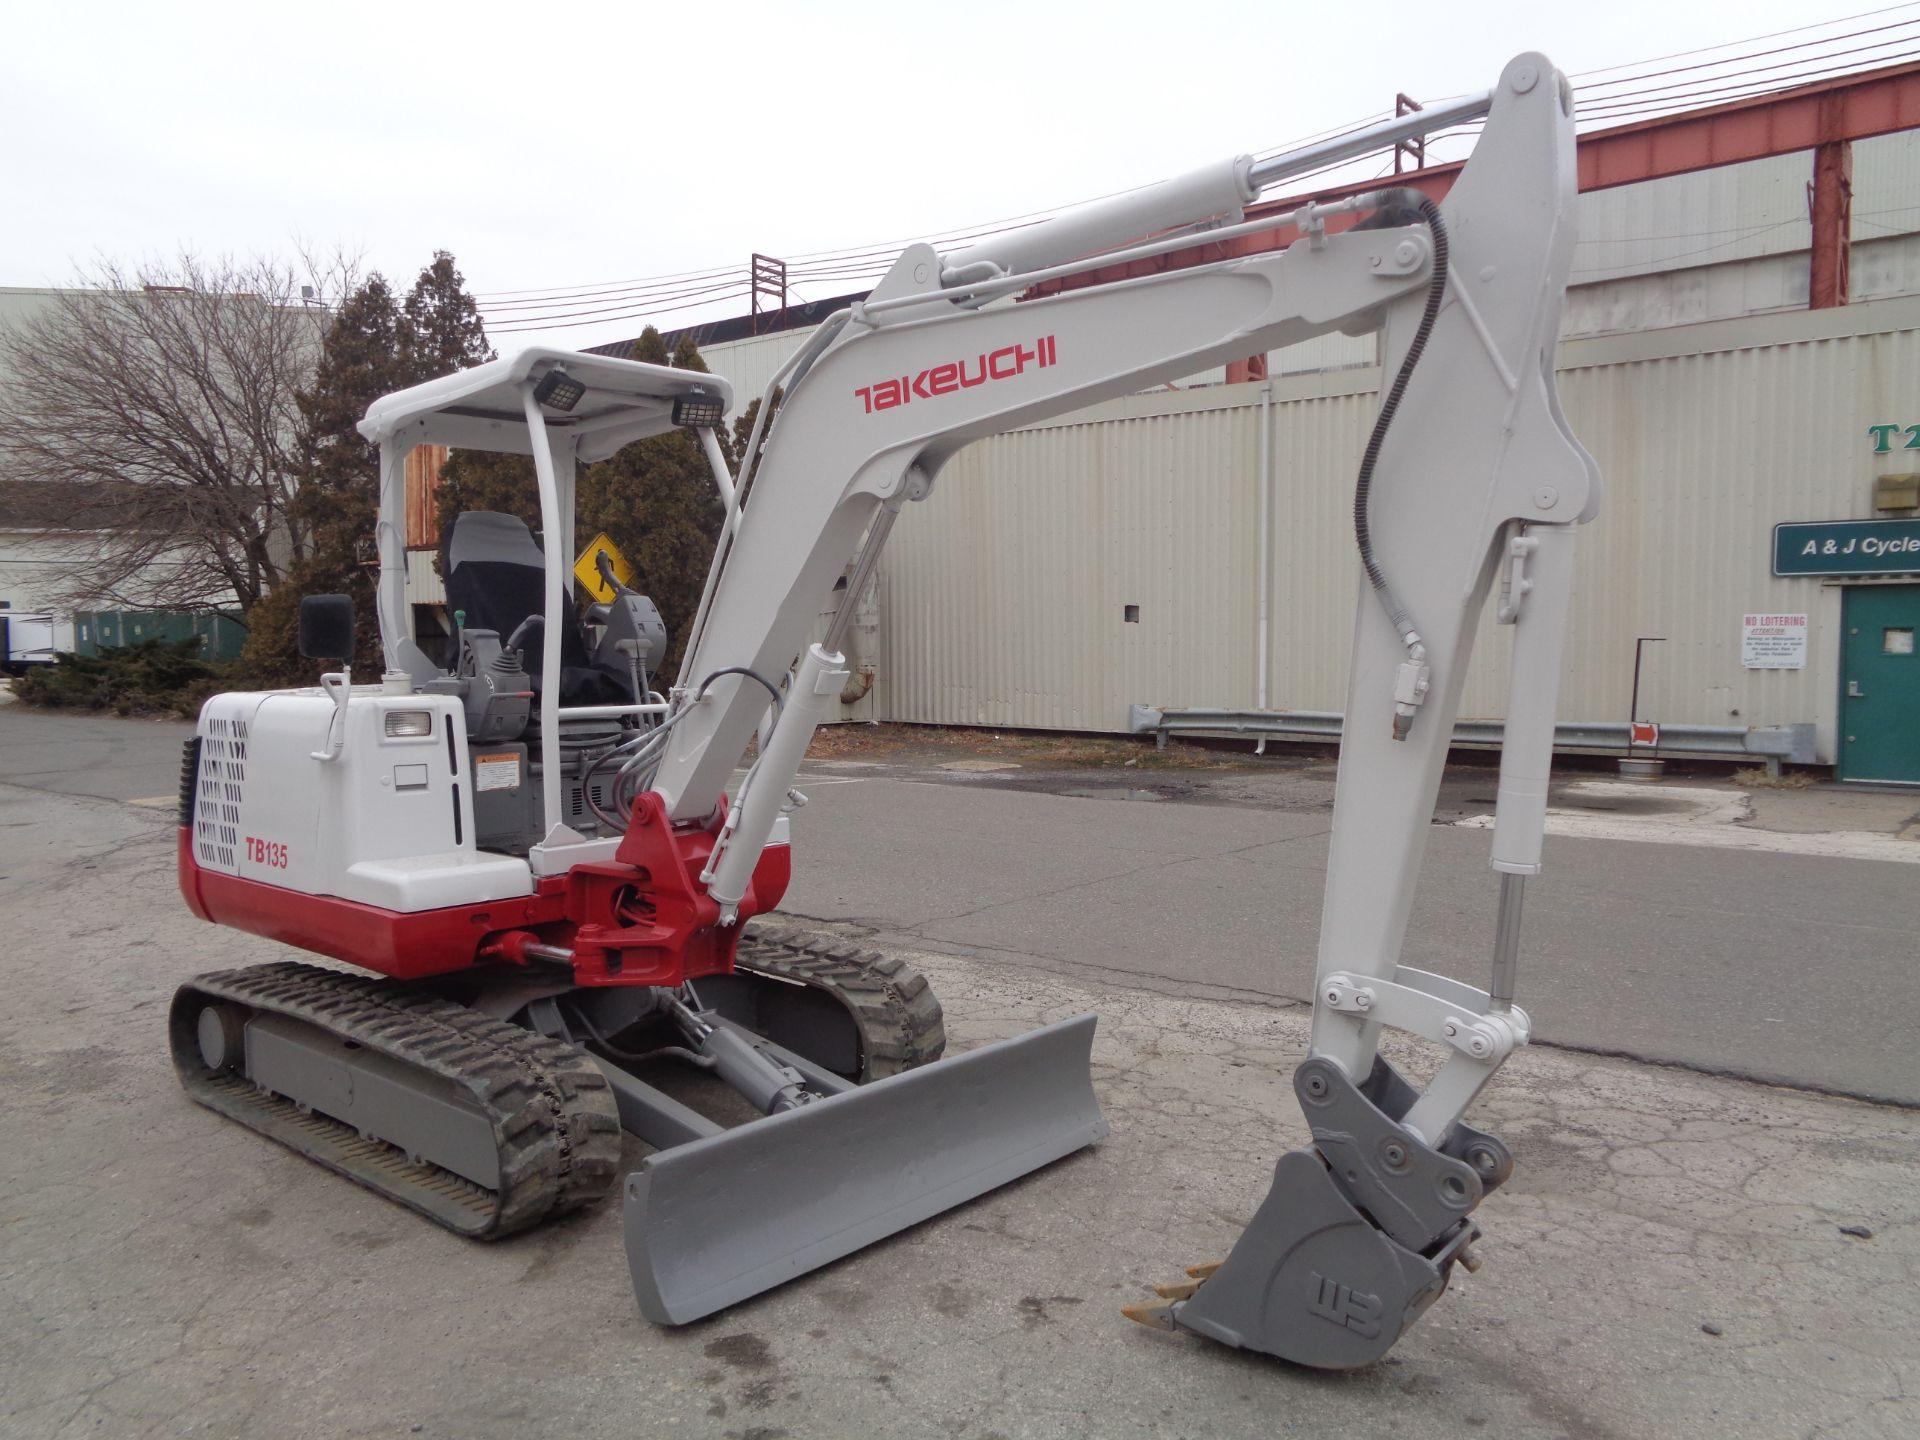 Lot 35A - Takeuchi TB135 Mini Excavator